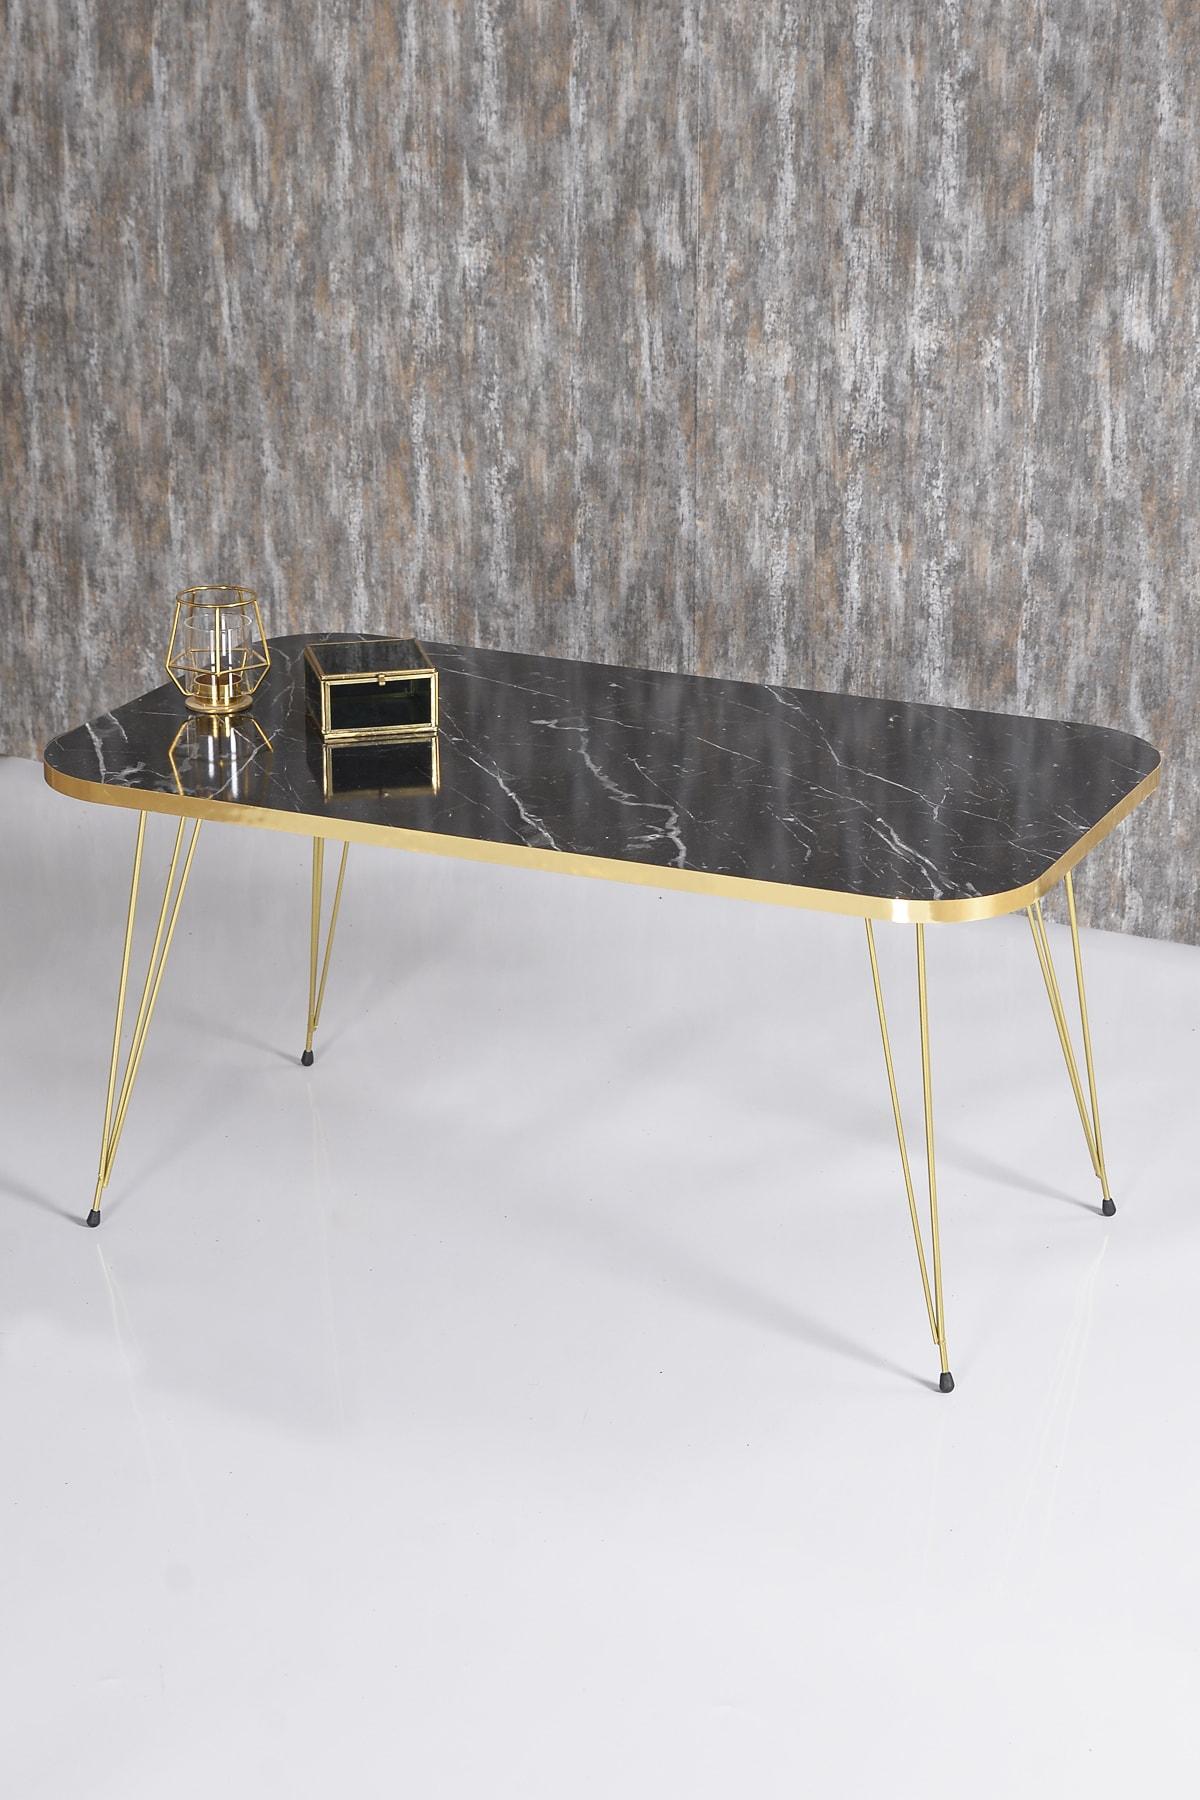 Medium Coffee Table coffee table gold legs coffee table turkiyede manufactured